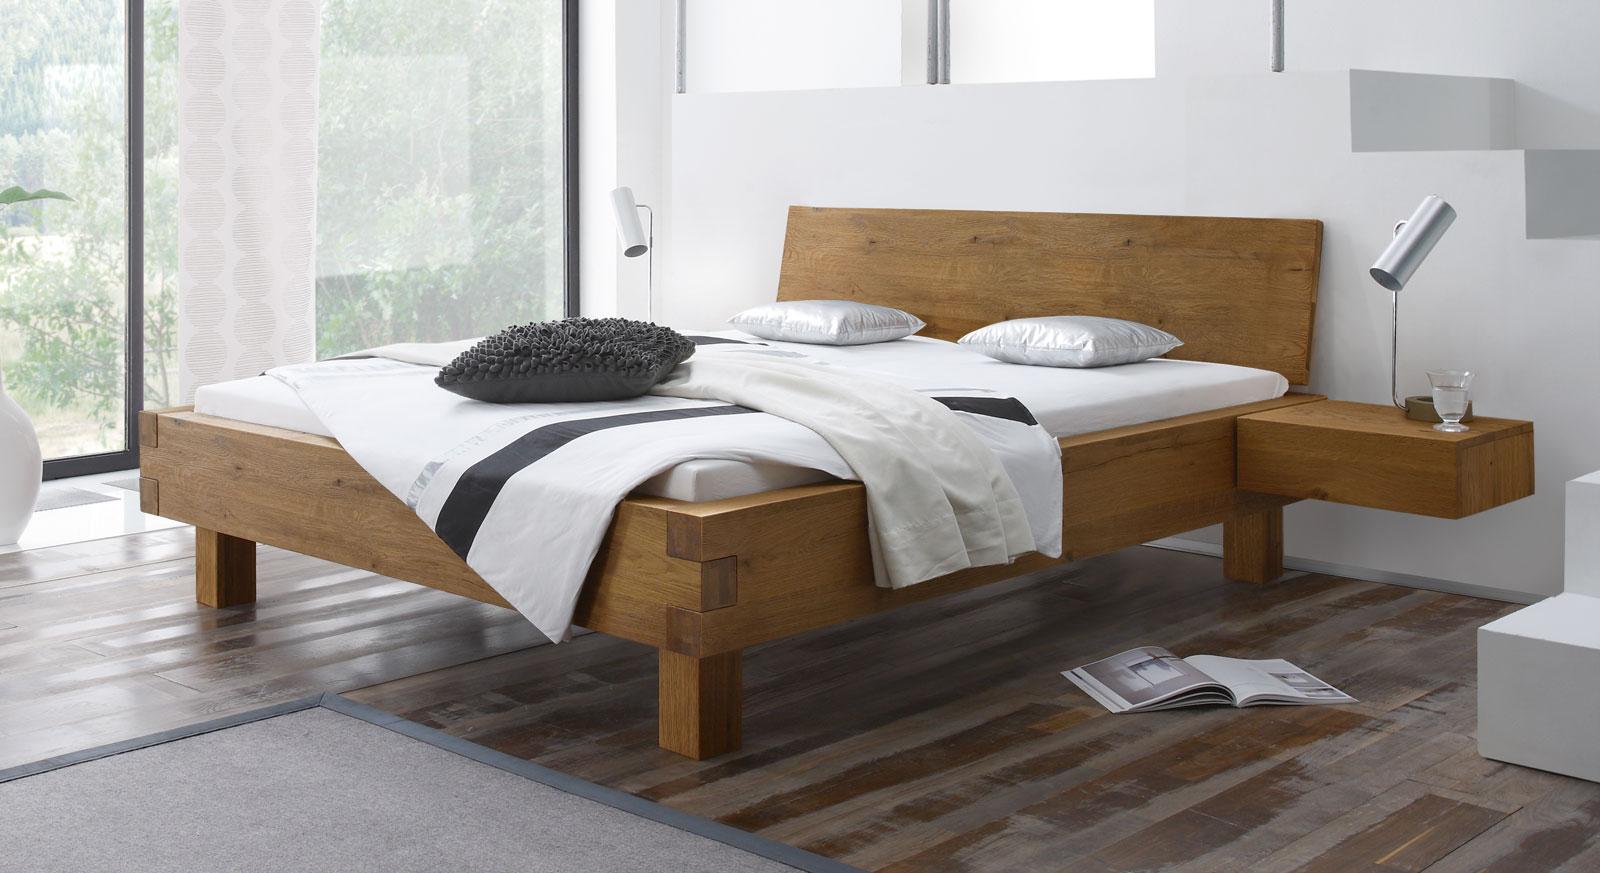 Bett Kasos aus massivem Wildeichenholz